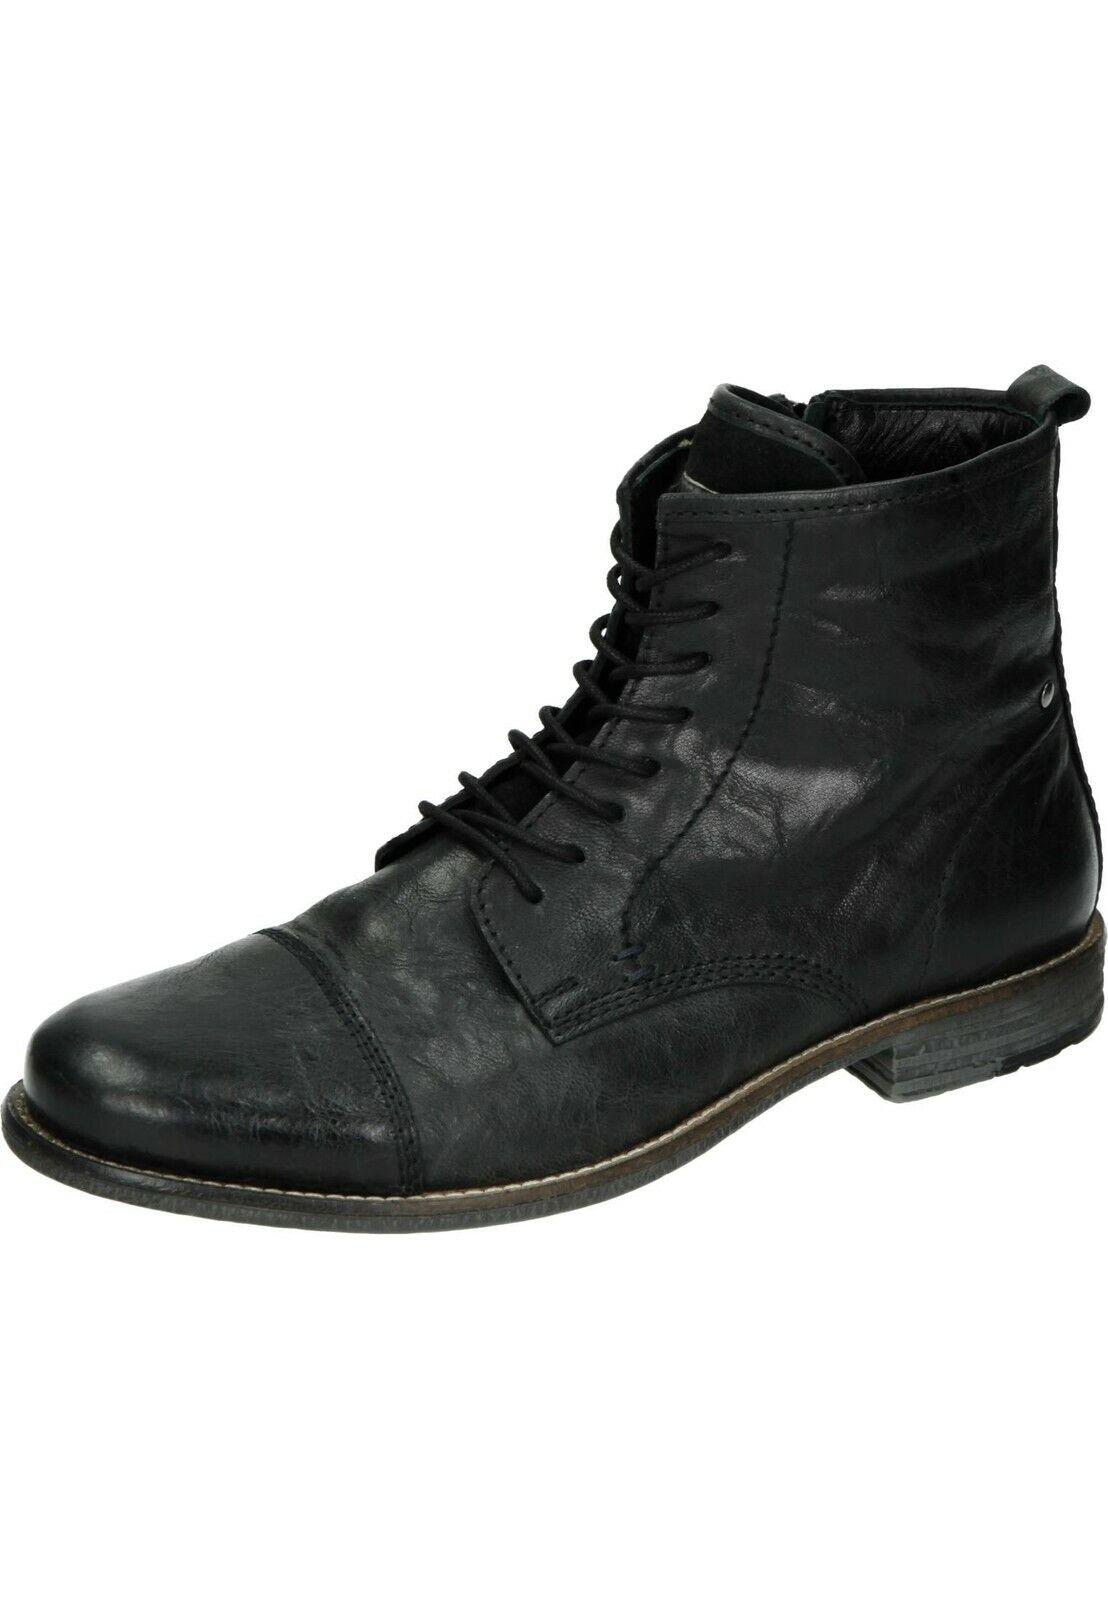 Manitu botas piel botines zapatos caballero negros neu21